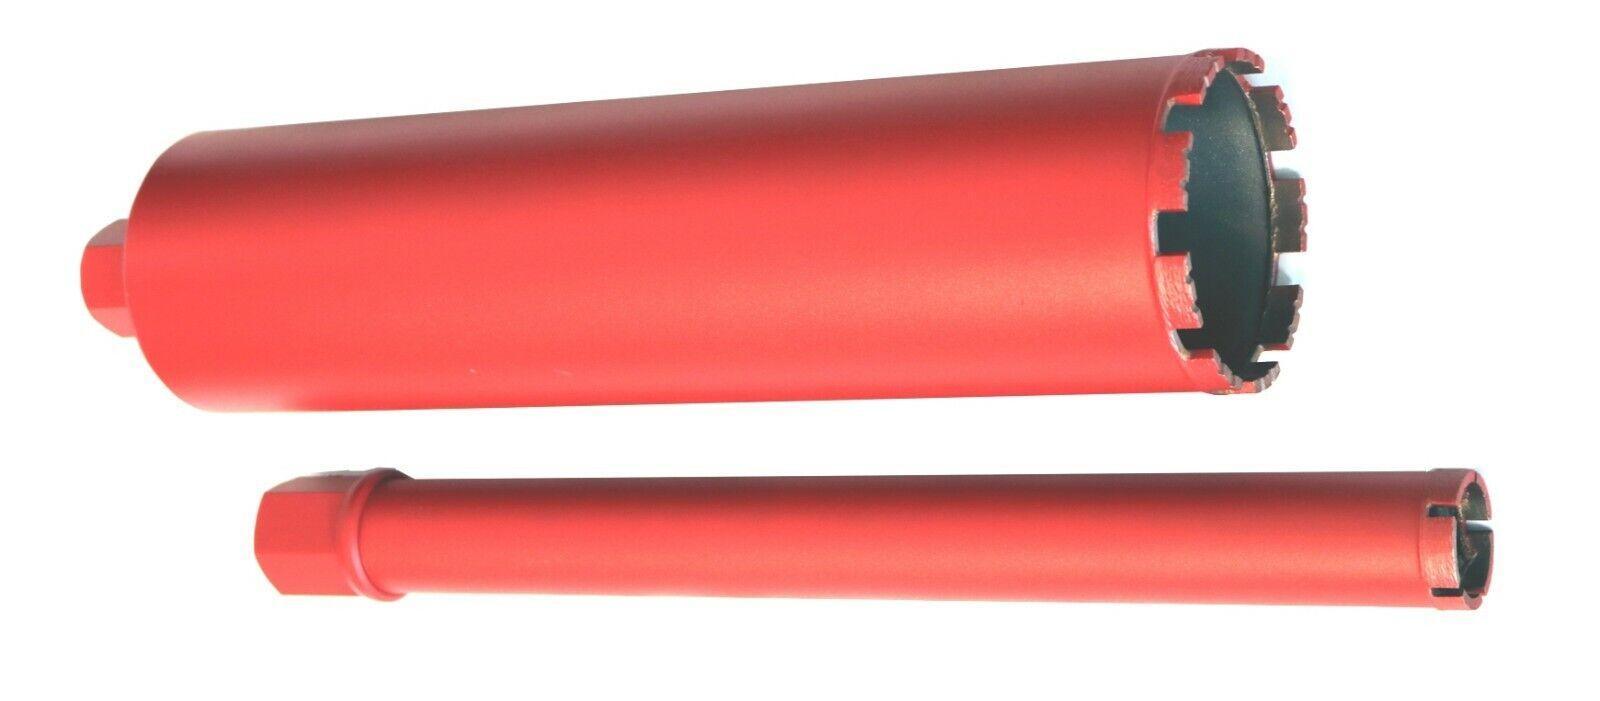 Trocken Ø 26-300 mm NL=400 mm Diamant-Bohrkrone Dosenbohrer Kernbohrkrone Nass